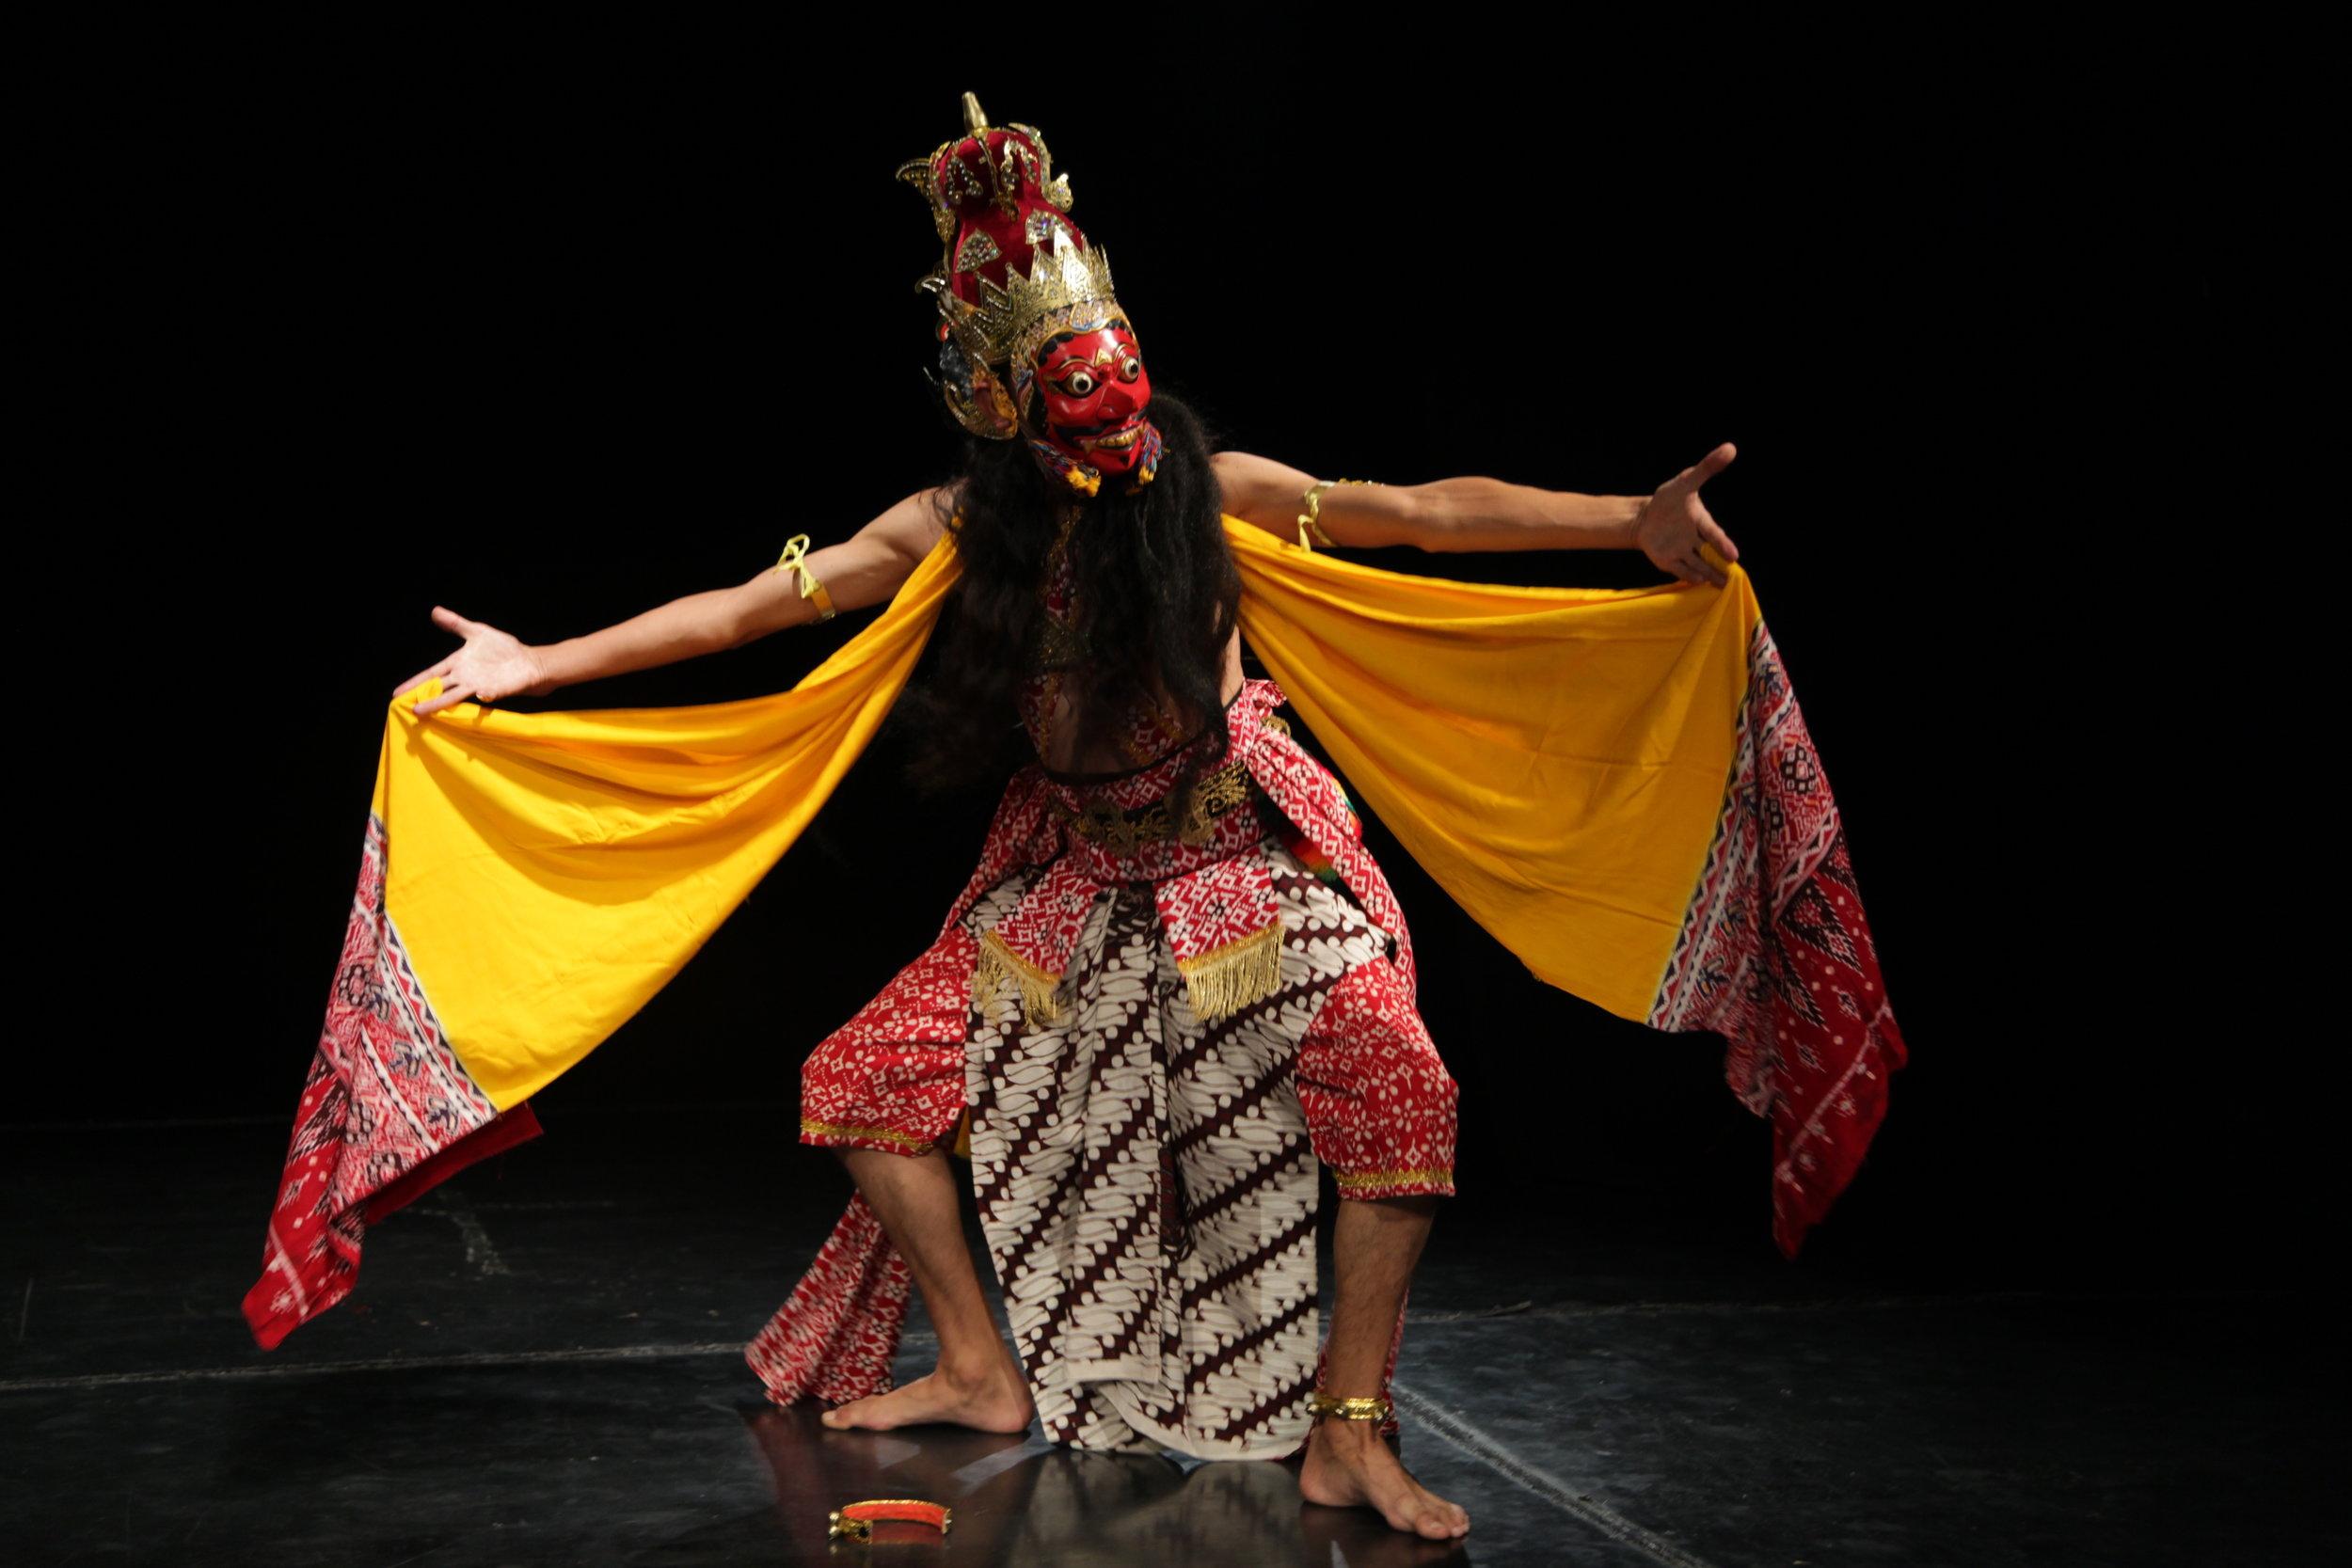 Danza Topeng de Indonesia.  Edgar Freire. Foto Silvia Echevarria El Apuntador